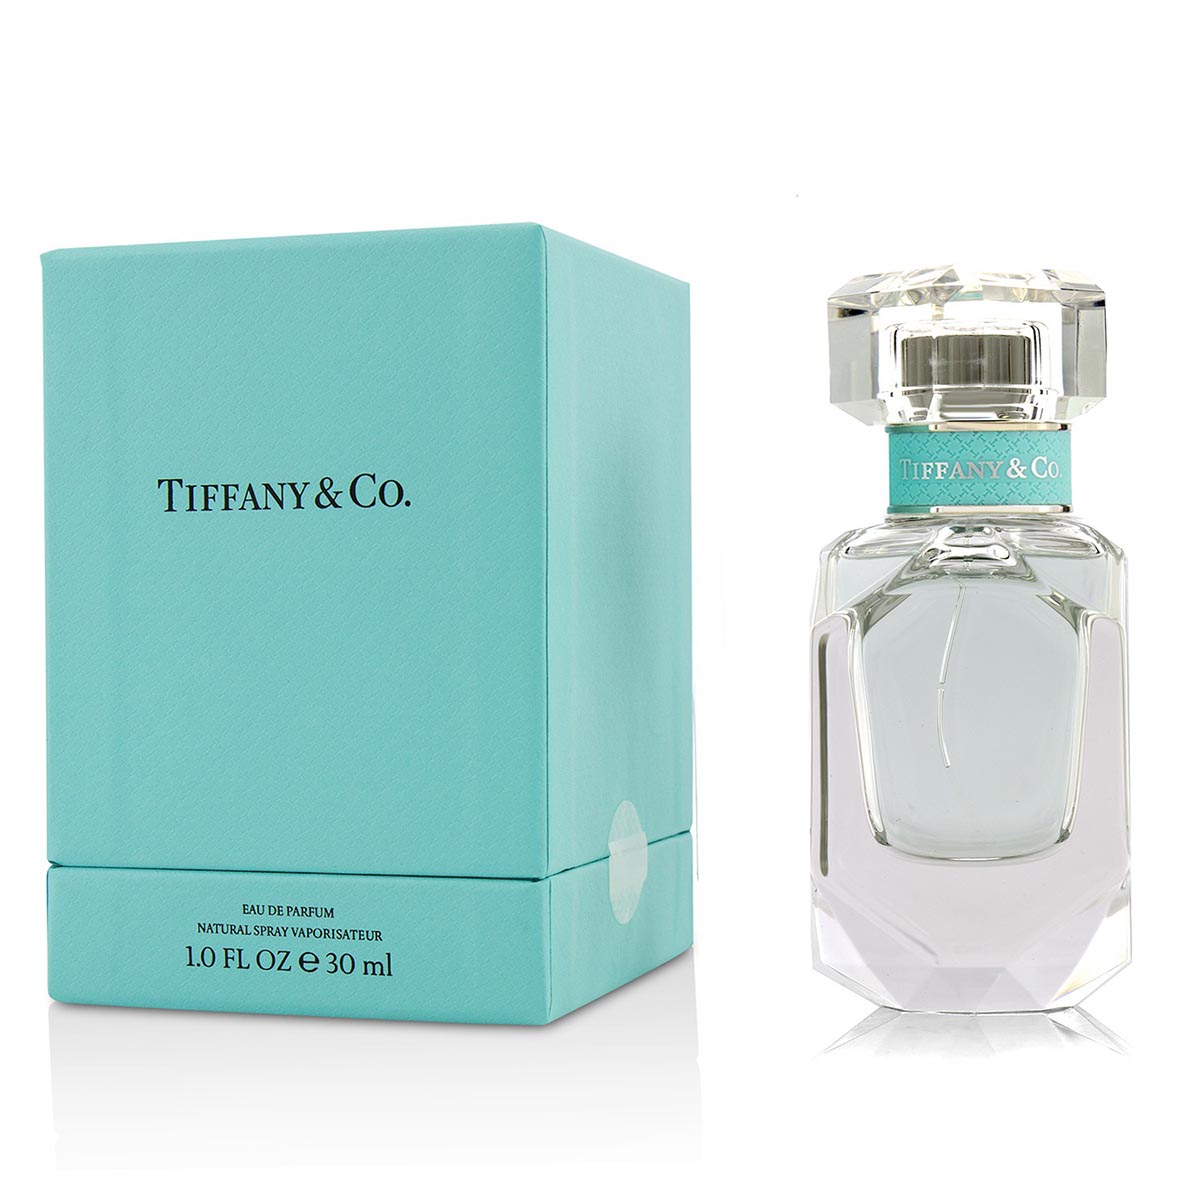 Tiffany co eau de parfum 30ml vaporizador